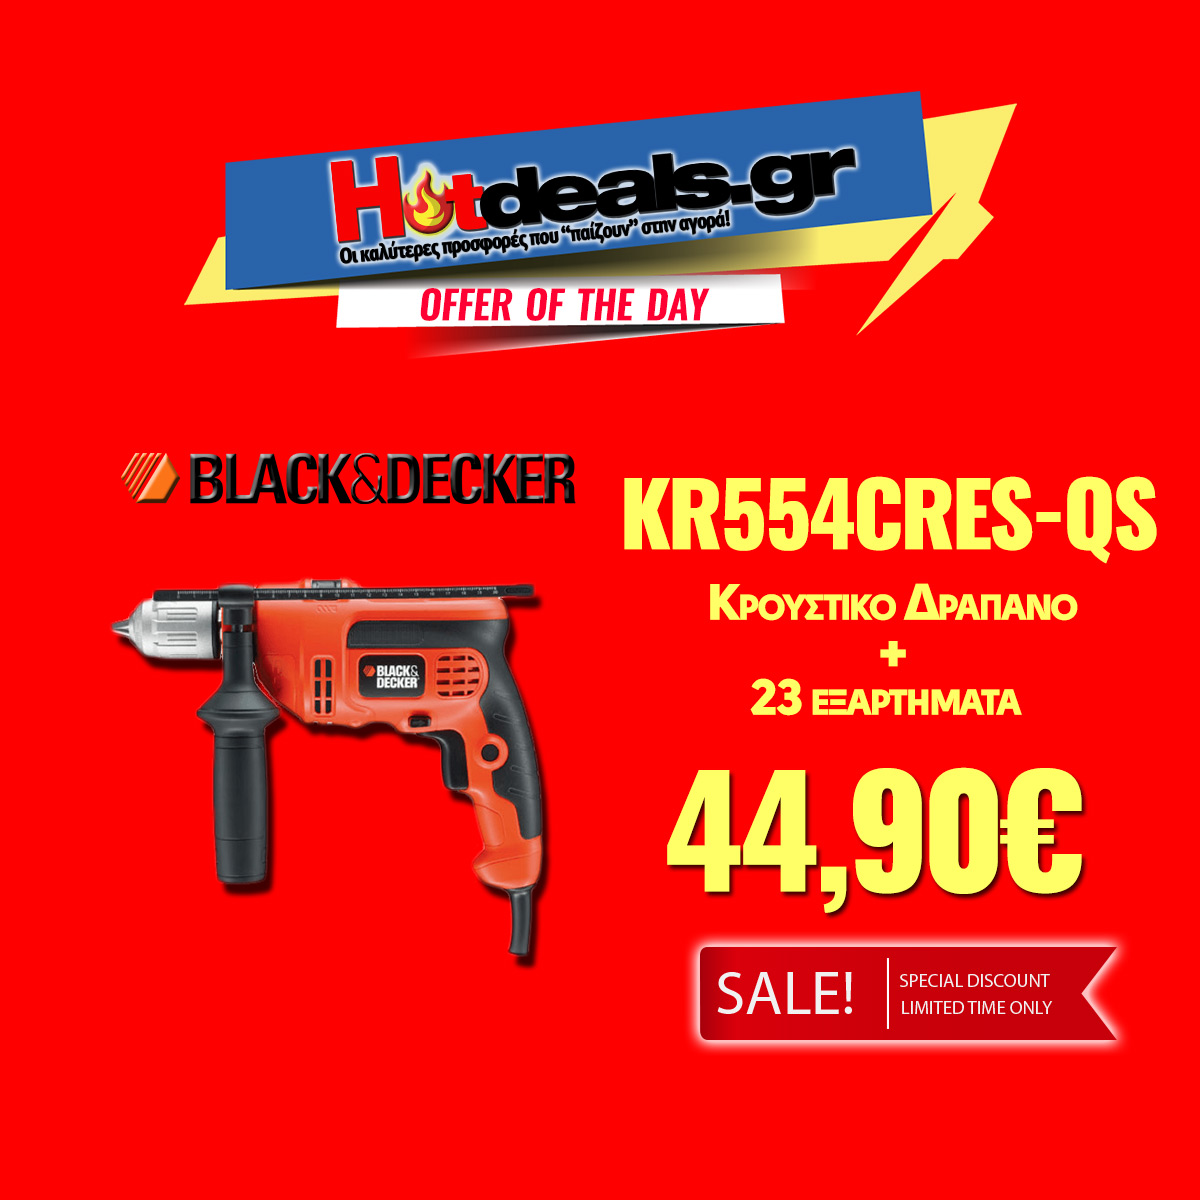 BLACK-&-DECKER-KR554CRES-QS-set-23-eksartimata